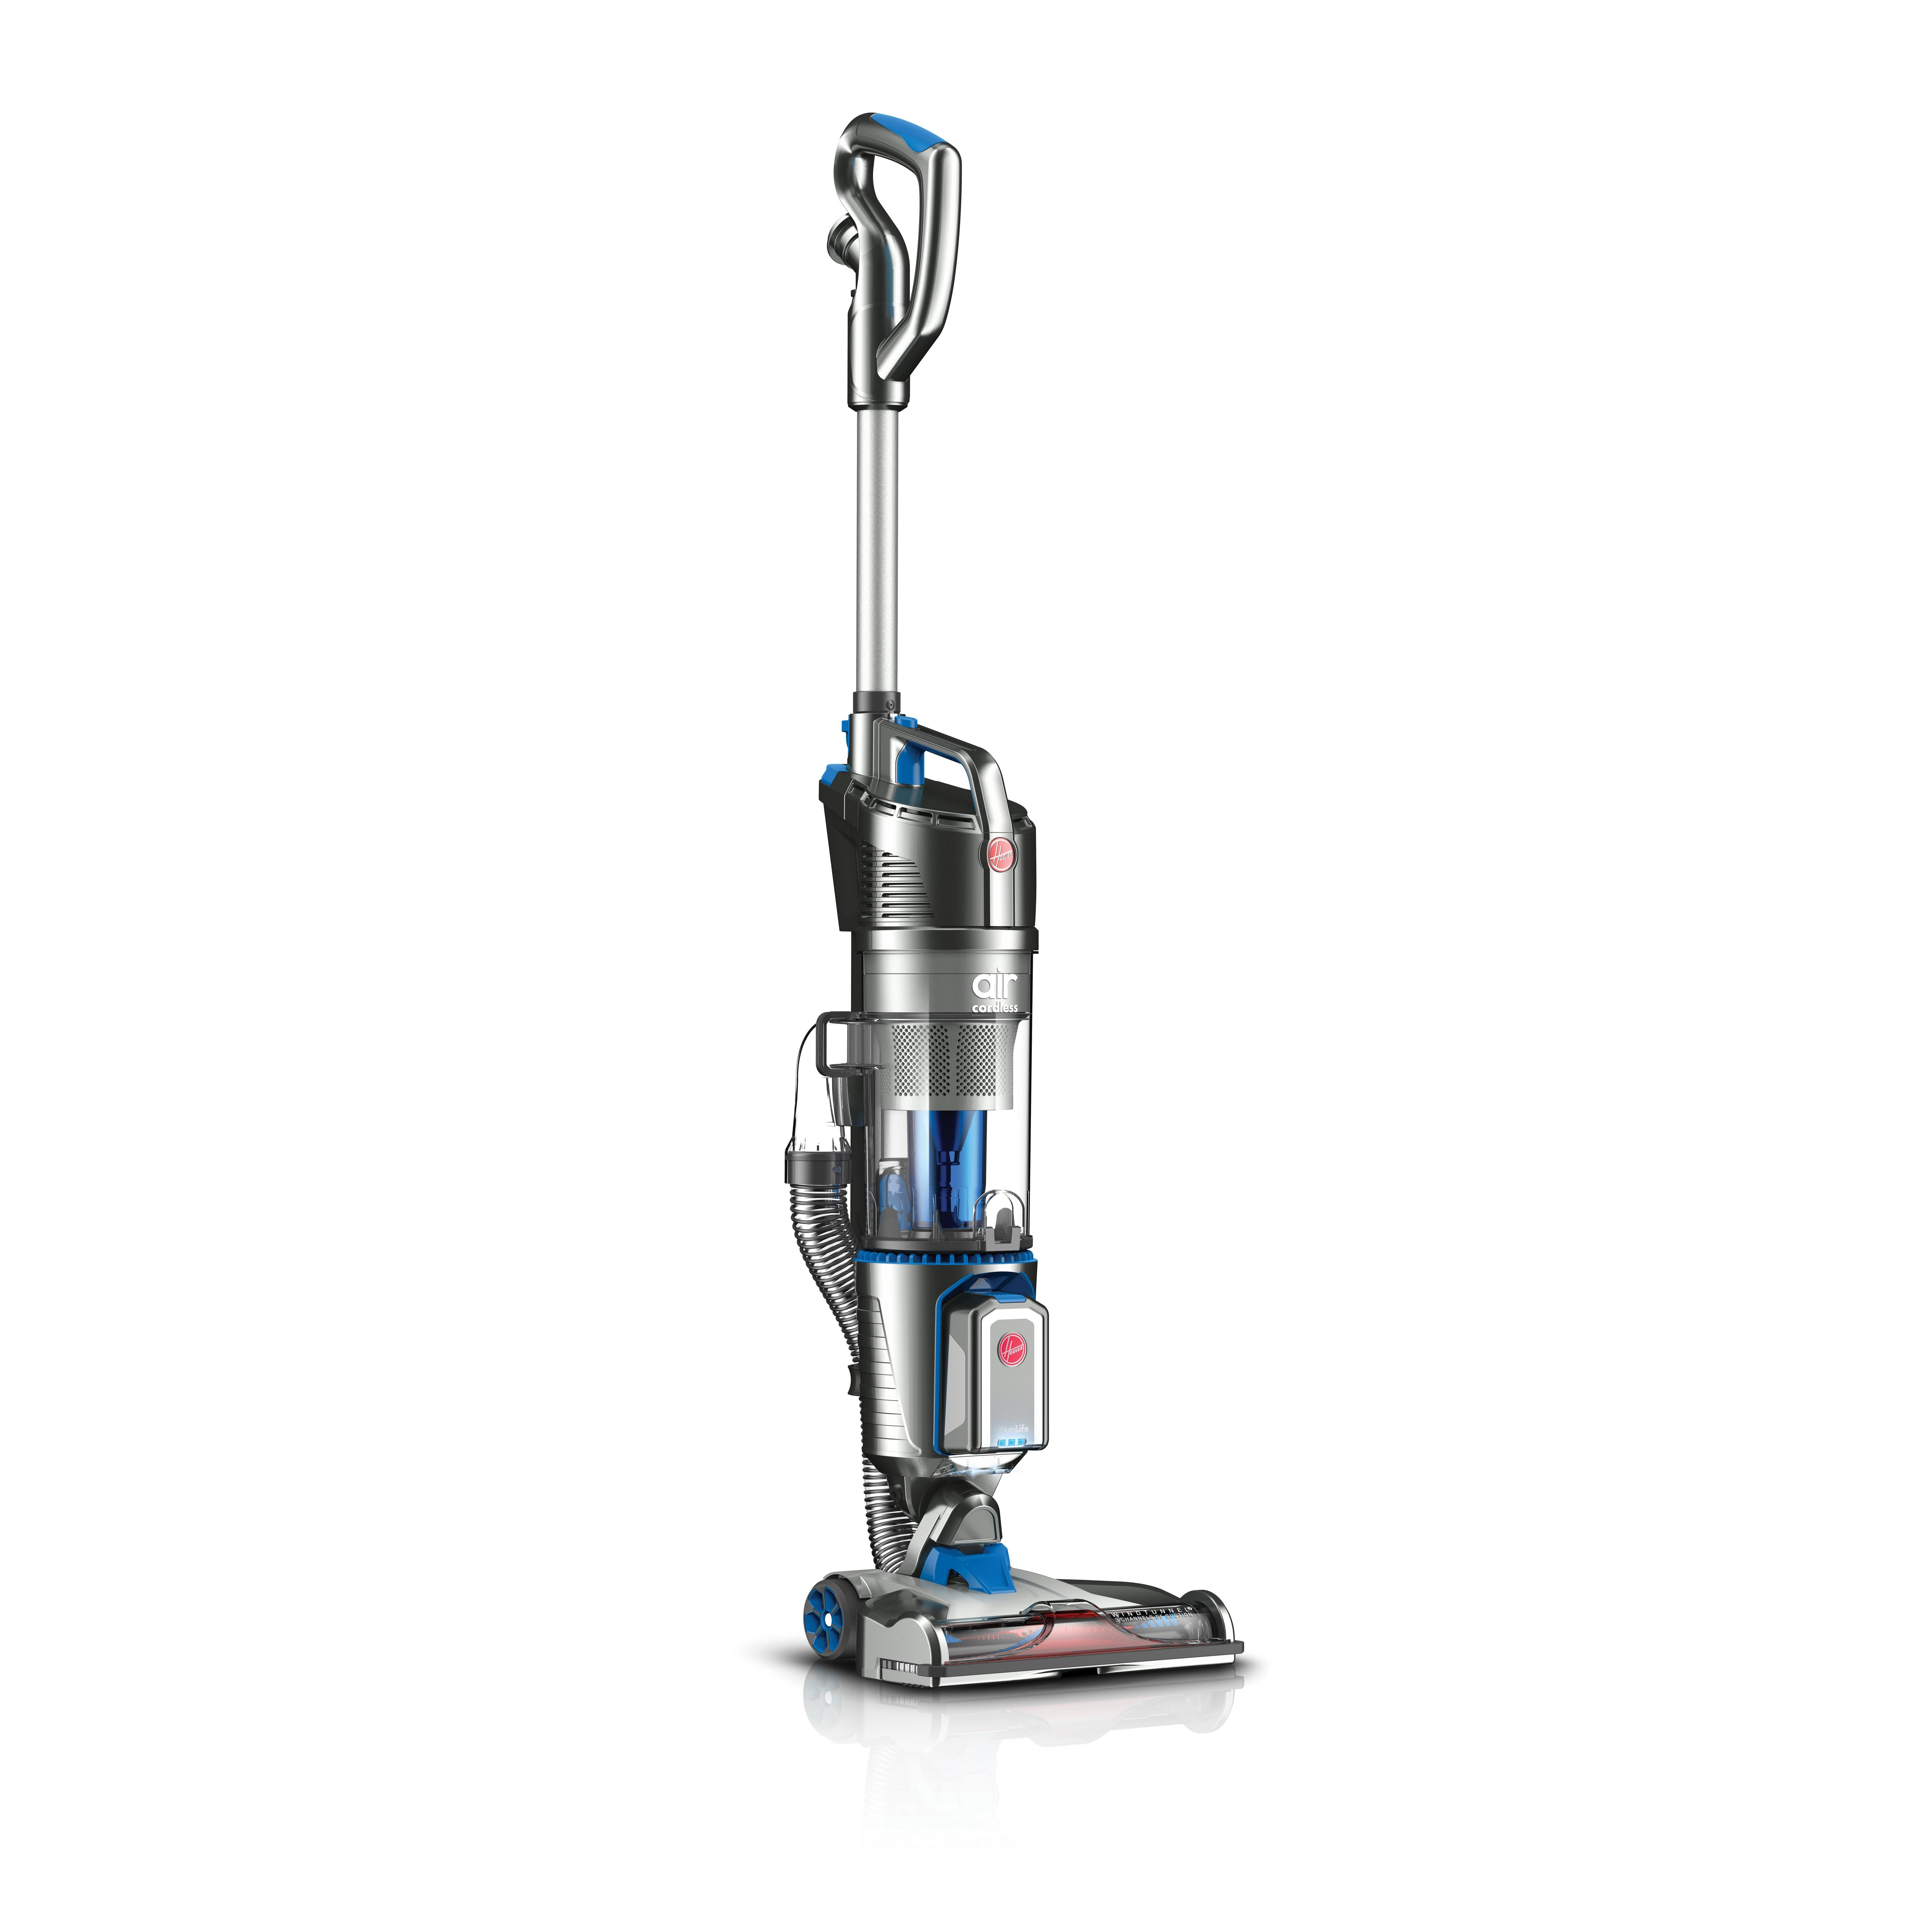 Air Cordless Series 3.0 Upright Vacuum2